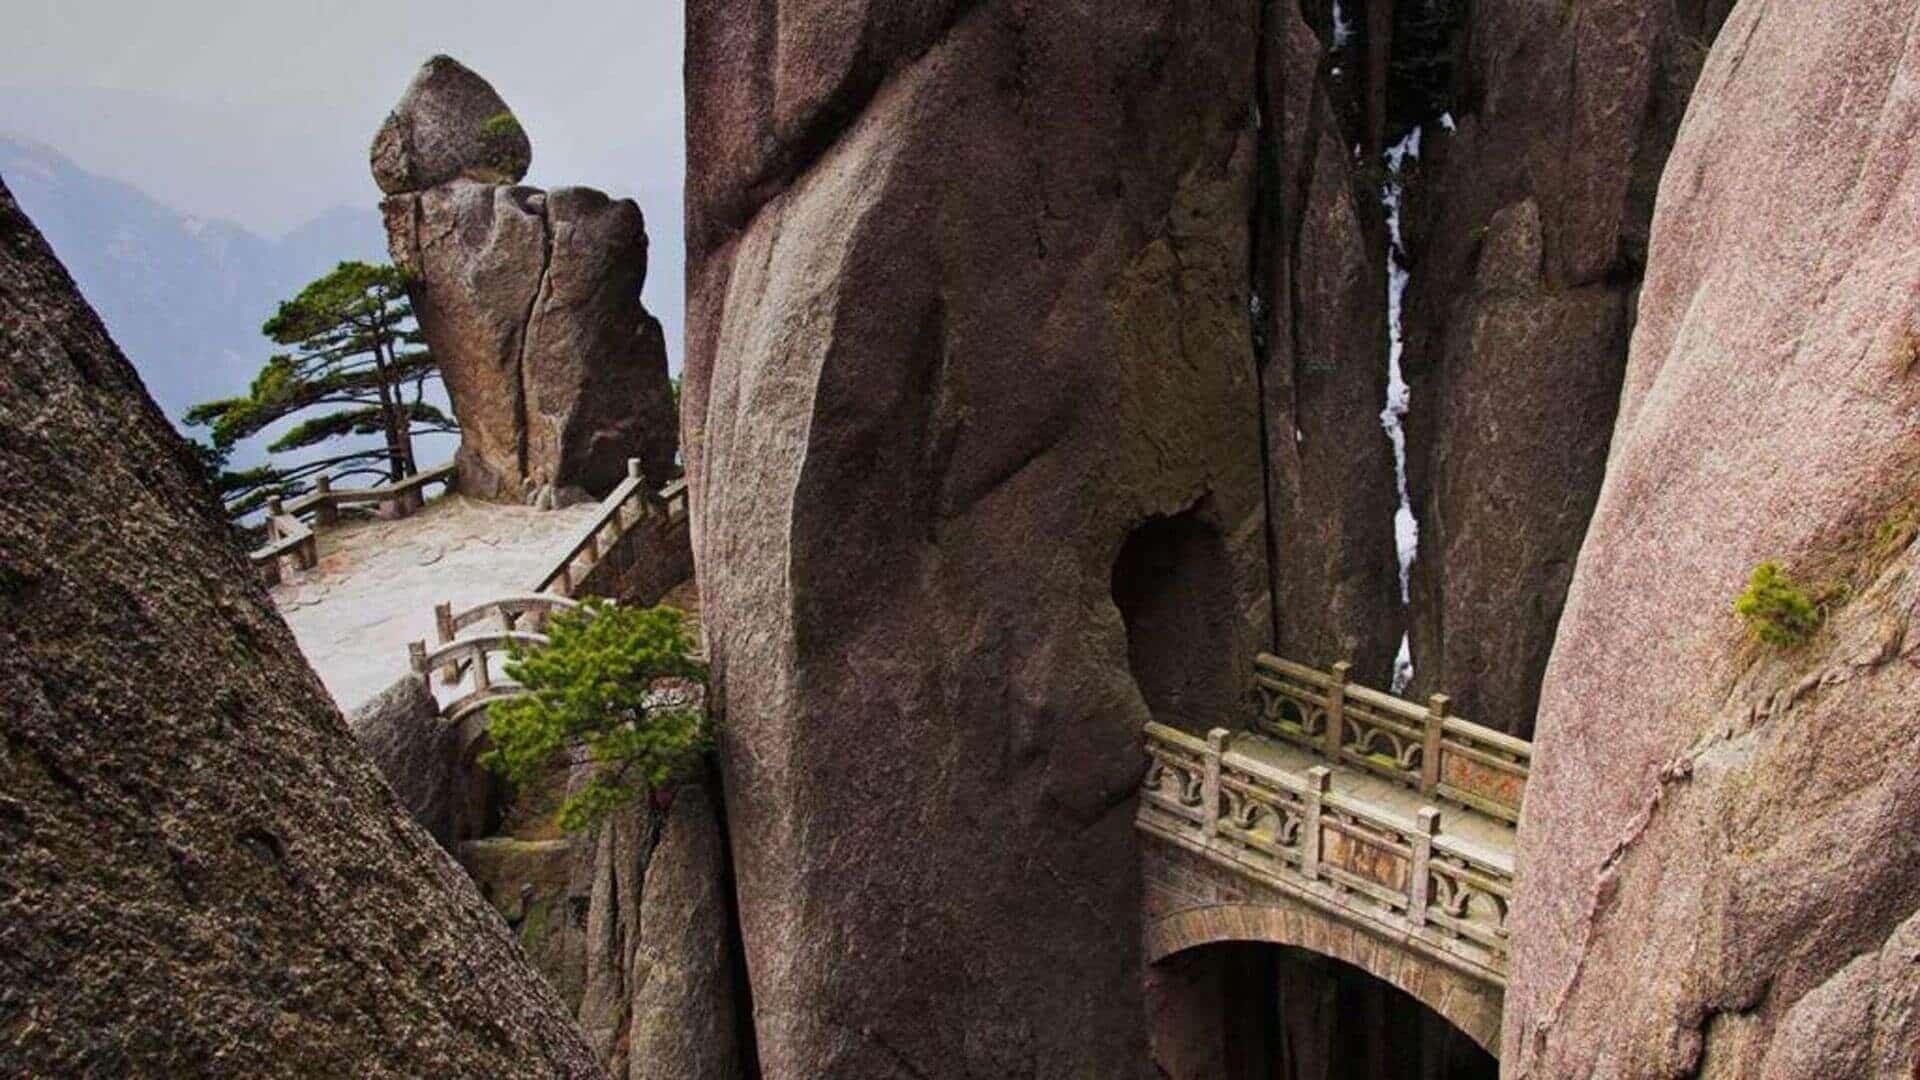 The Bridge of Immortals Huangshan, China